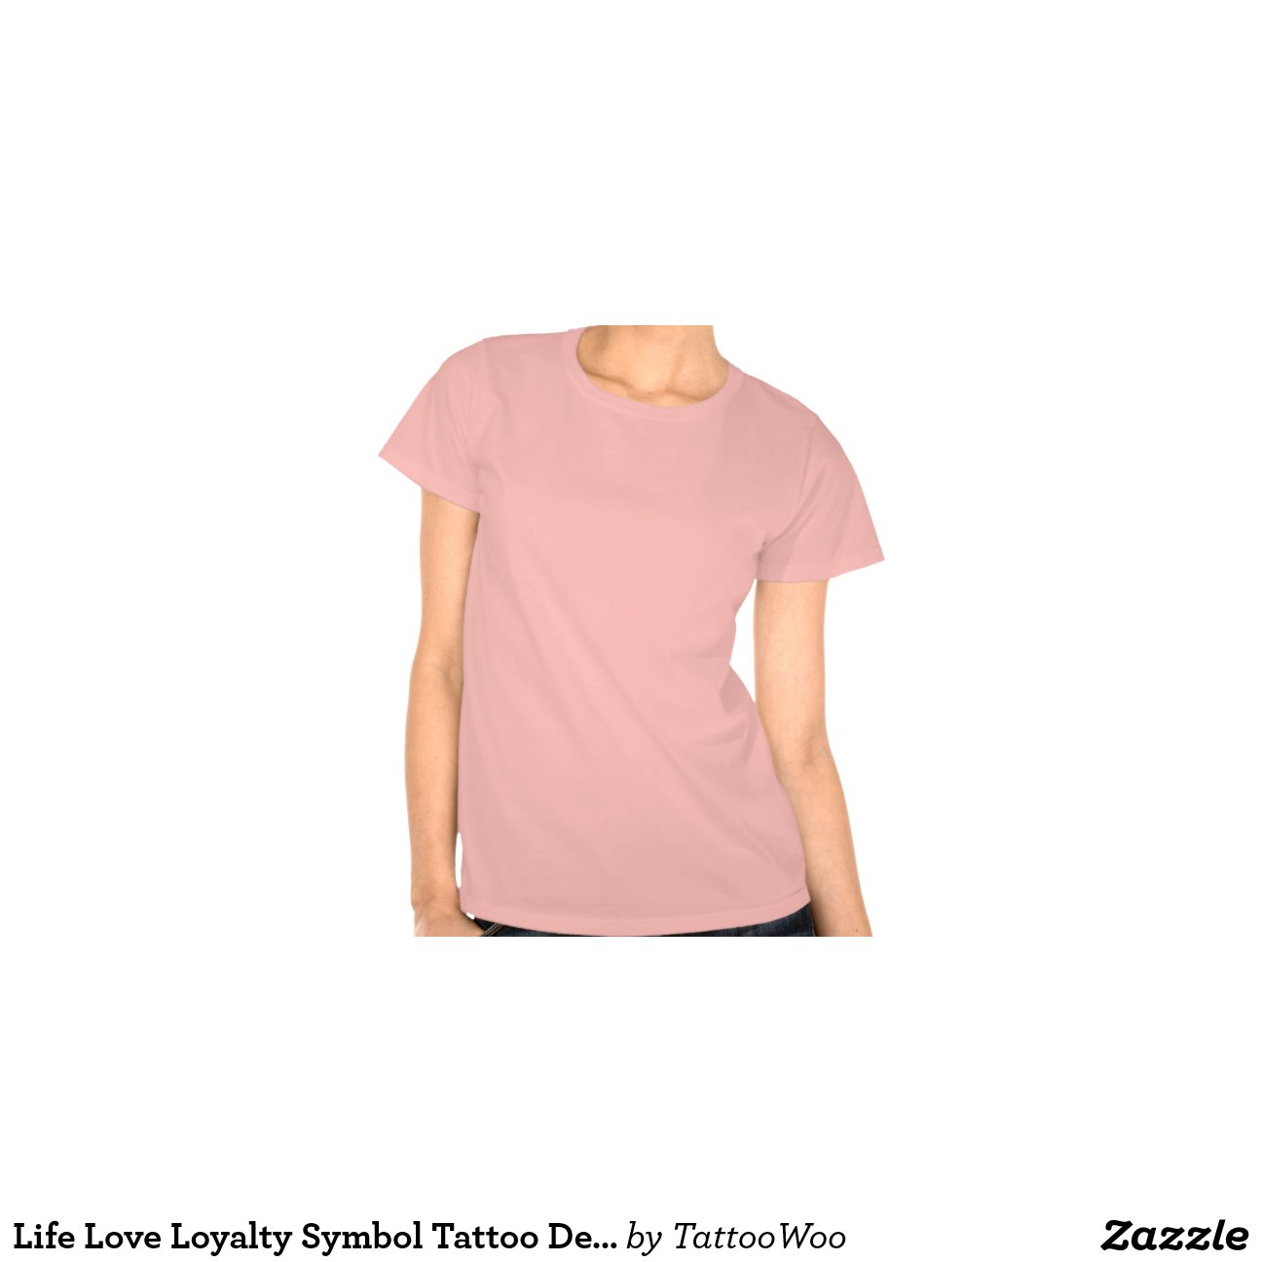 Life love loyalty symbol tattoo design t shirt zazzle Design t shirt australia